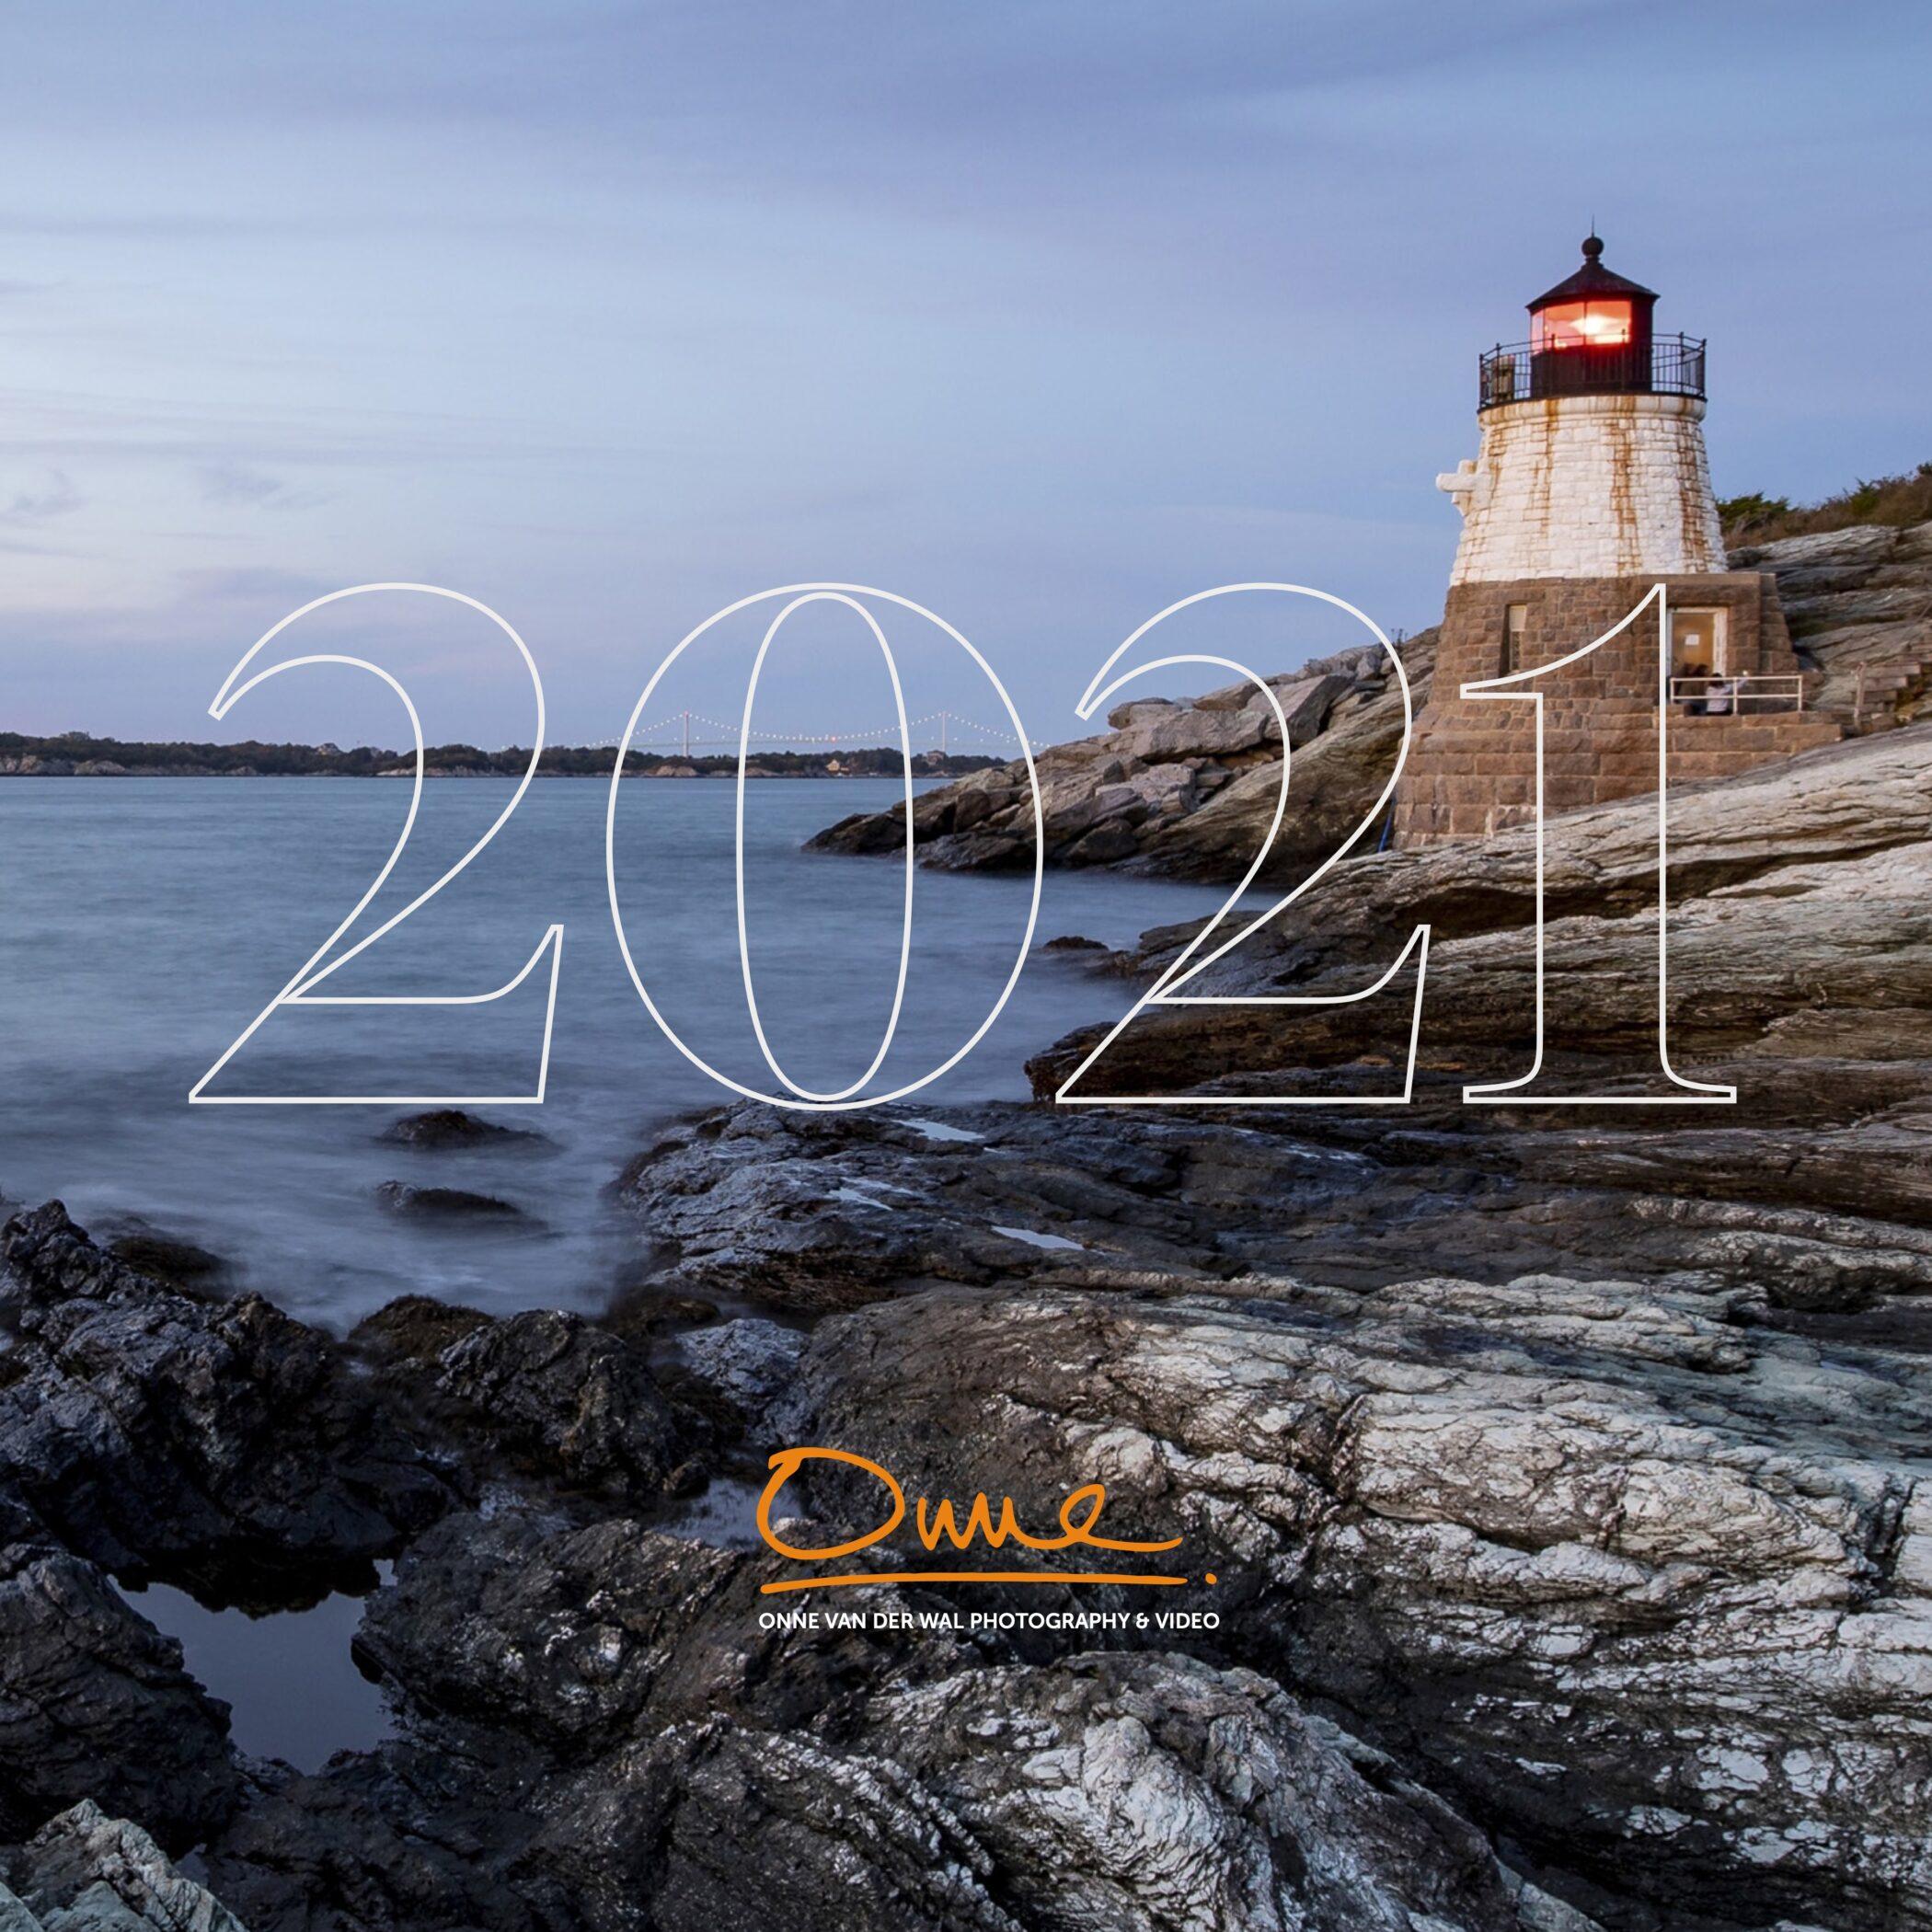 Rpi Calendar 2021 2021 Sailing Wall Calendar   Onne van der Wal